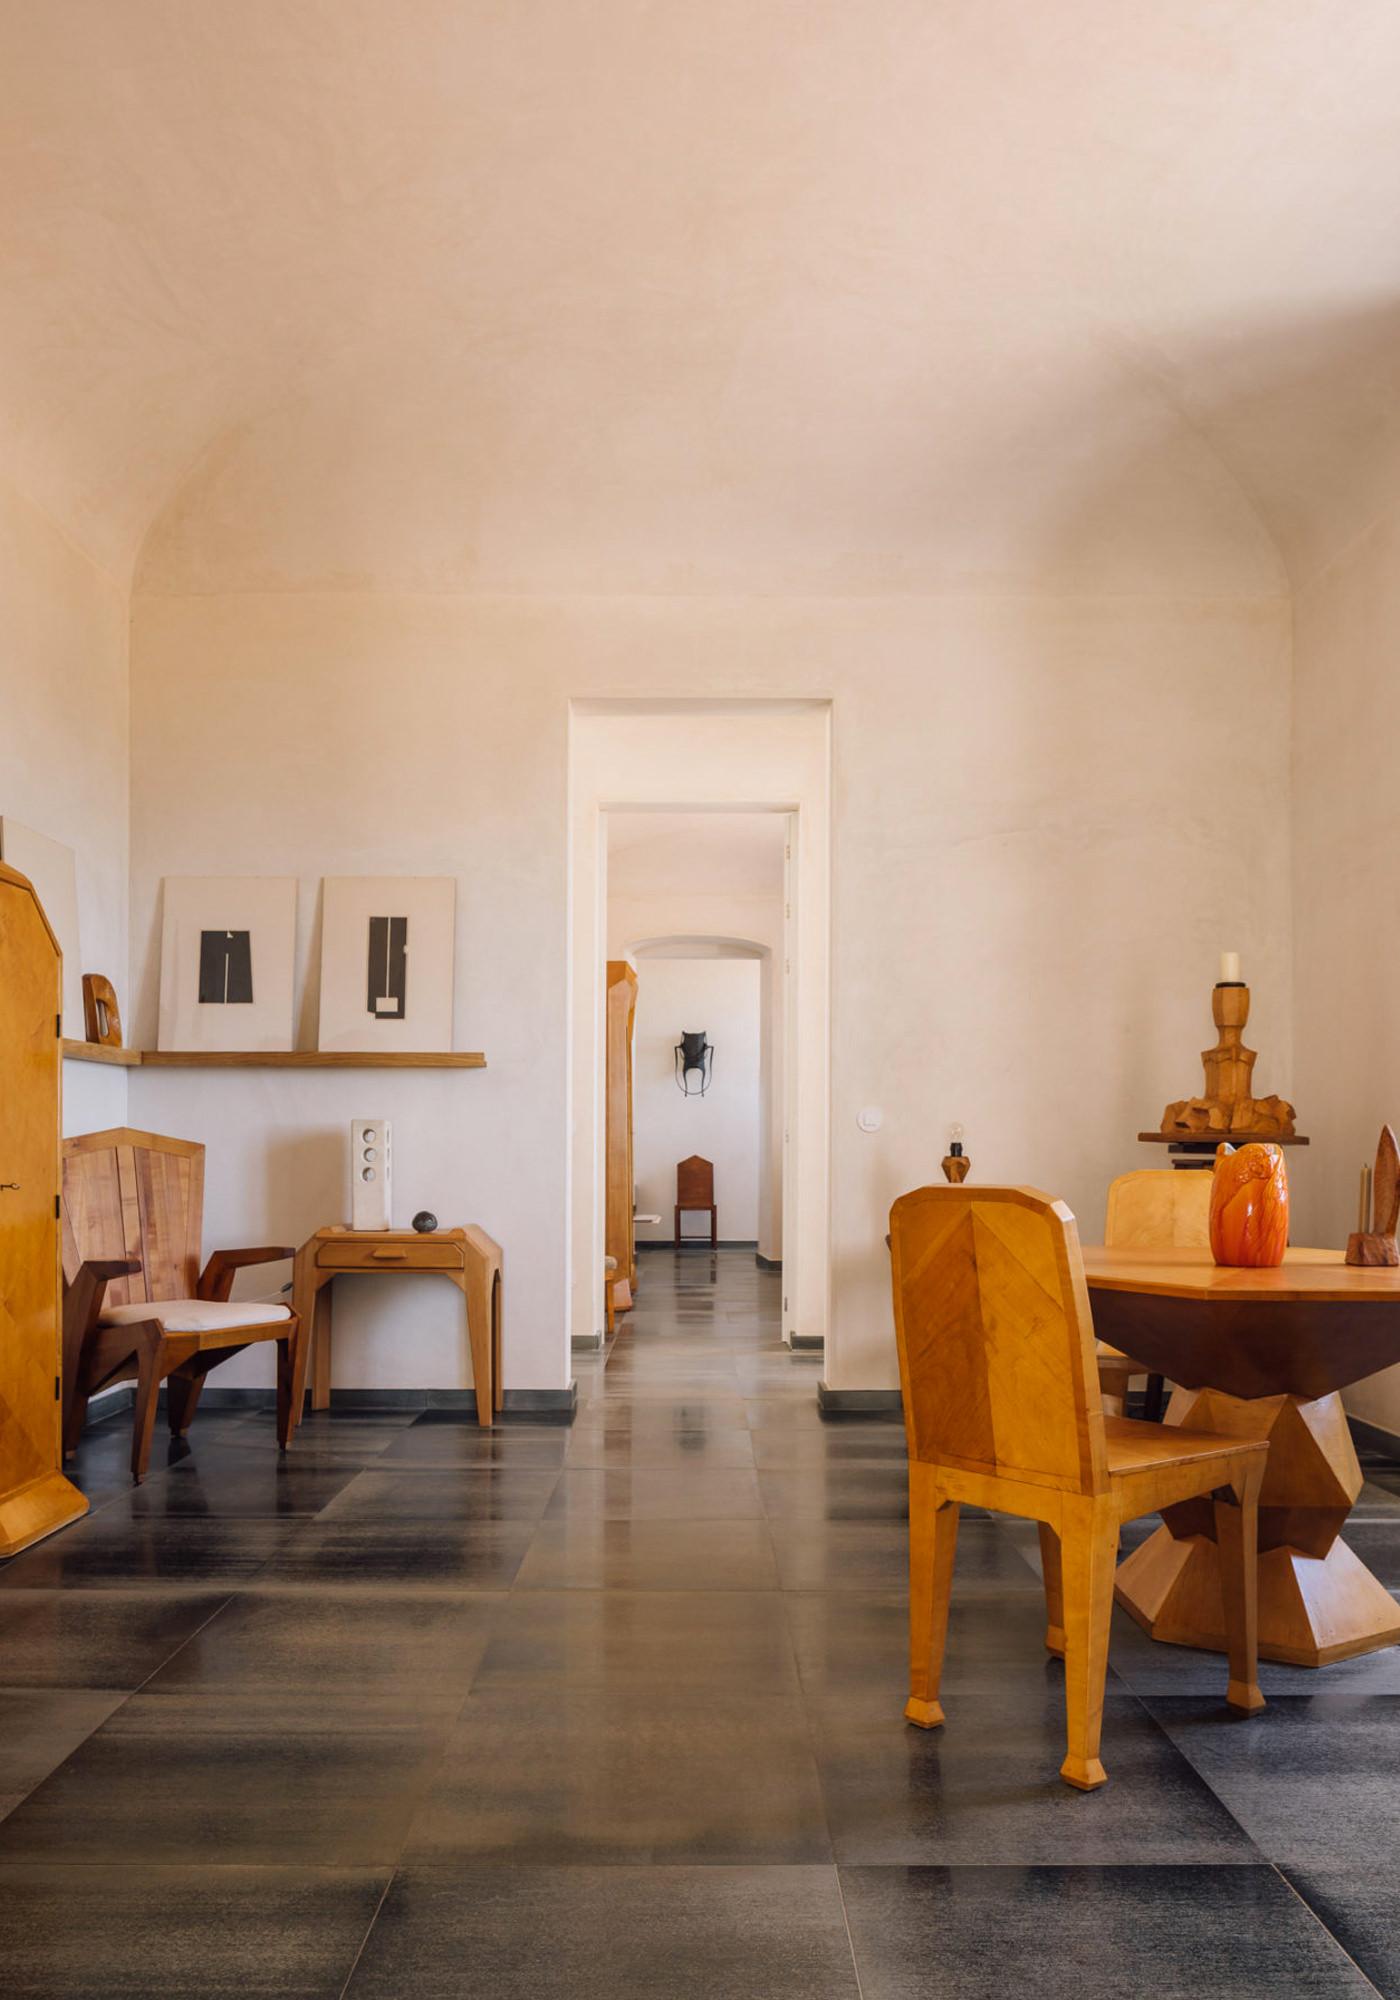 Da Licenca Hotel Alentejo Estremoz Portugal Mobiliers Collection